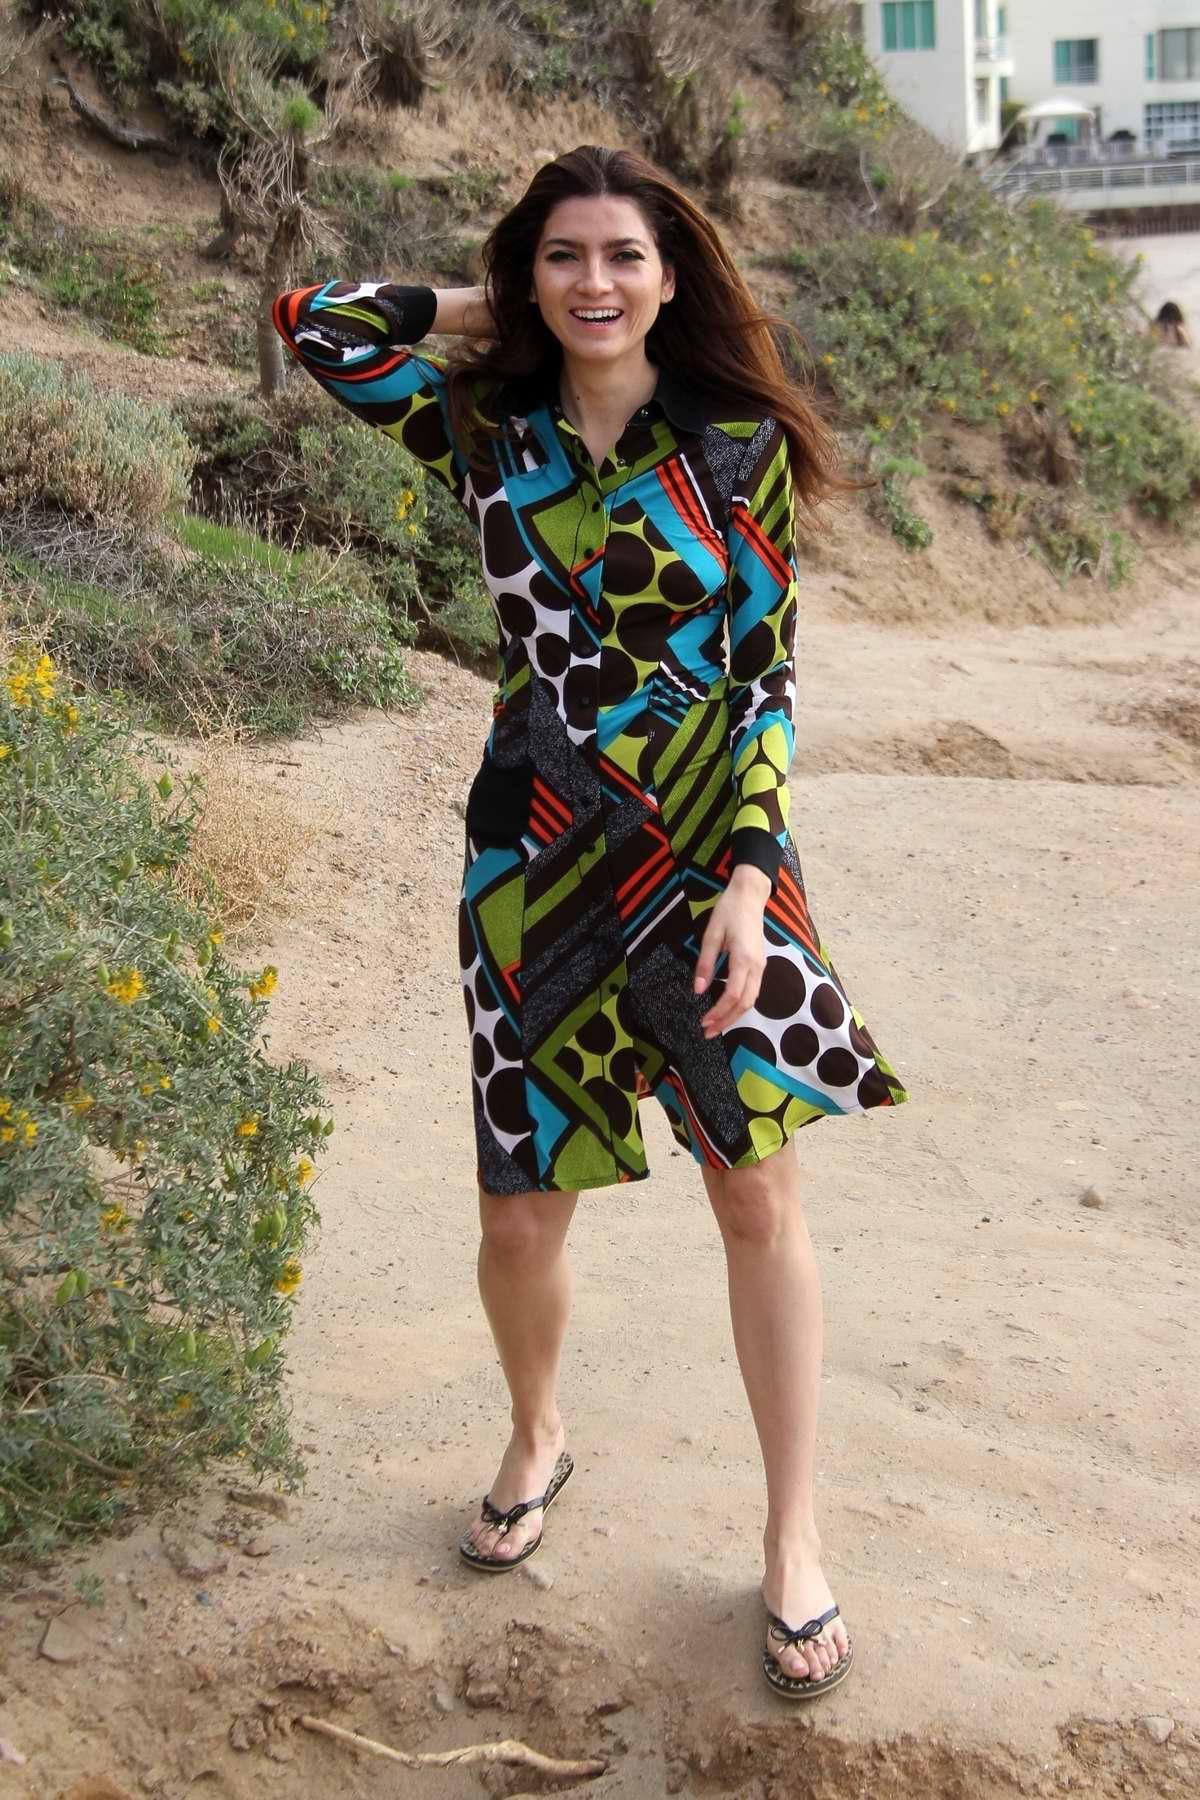 Blanca Blanco wears a multi-colored graphic print dress as she goes for a hike in Malibu, California